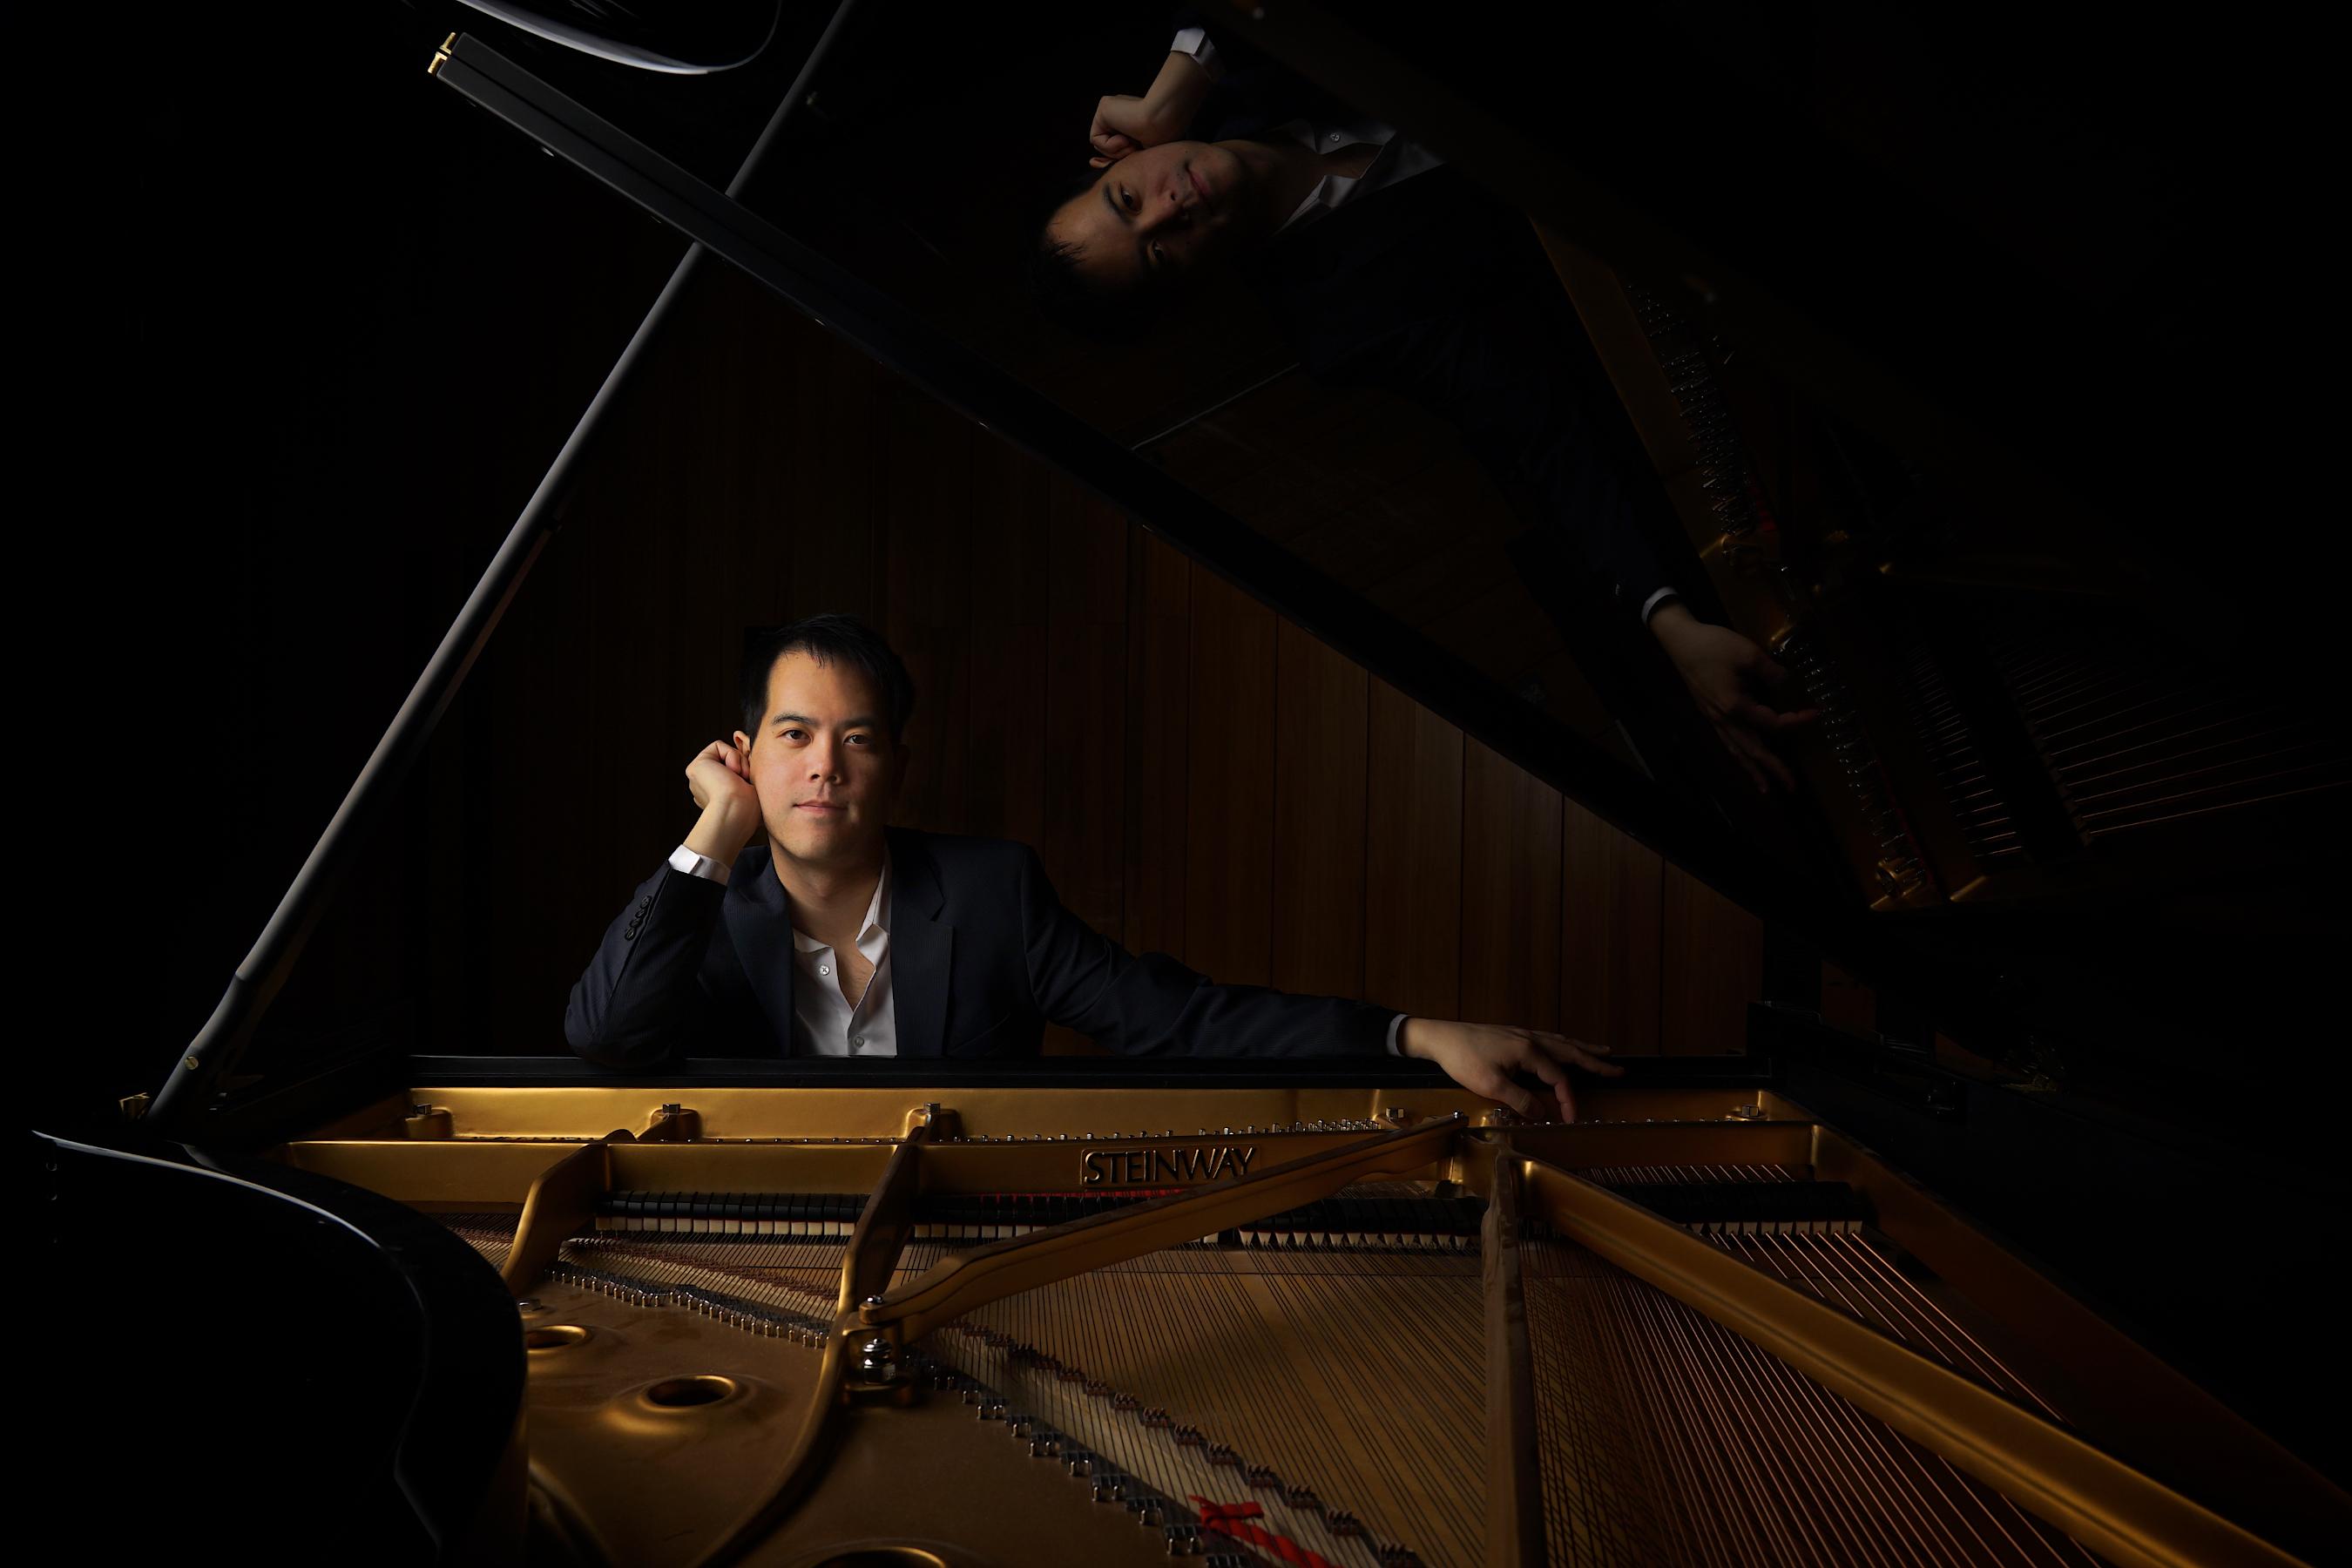 Pastimes for a Lifetime interviews pianist Frank Huang on his new Medtner CD